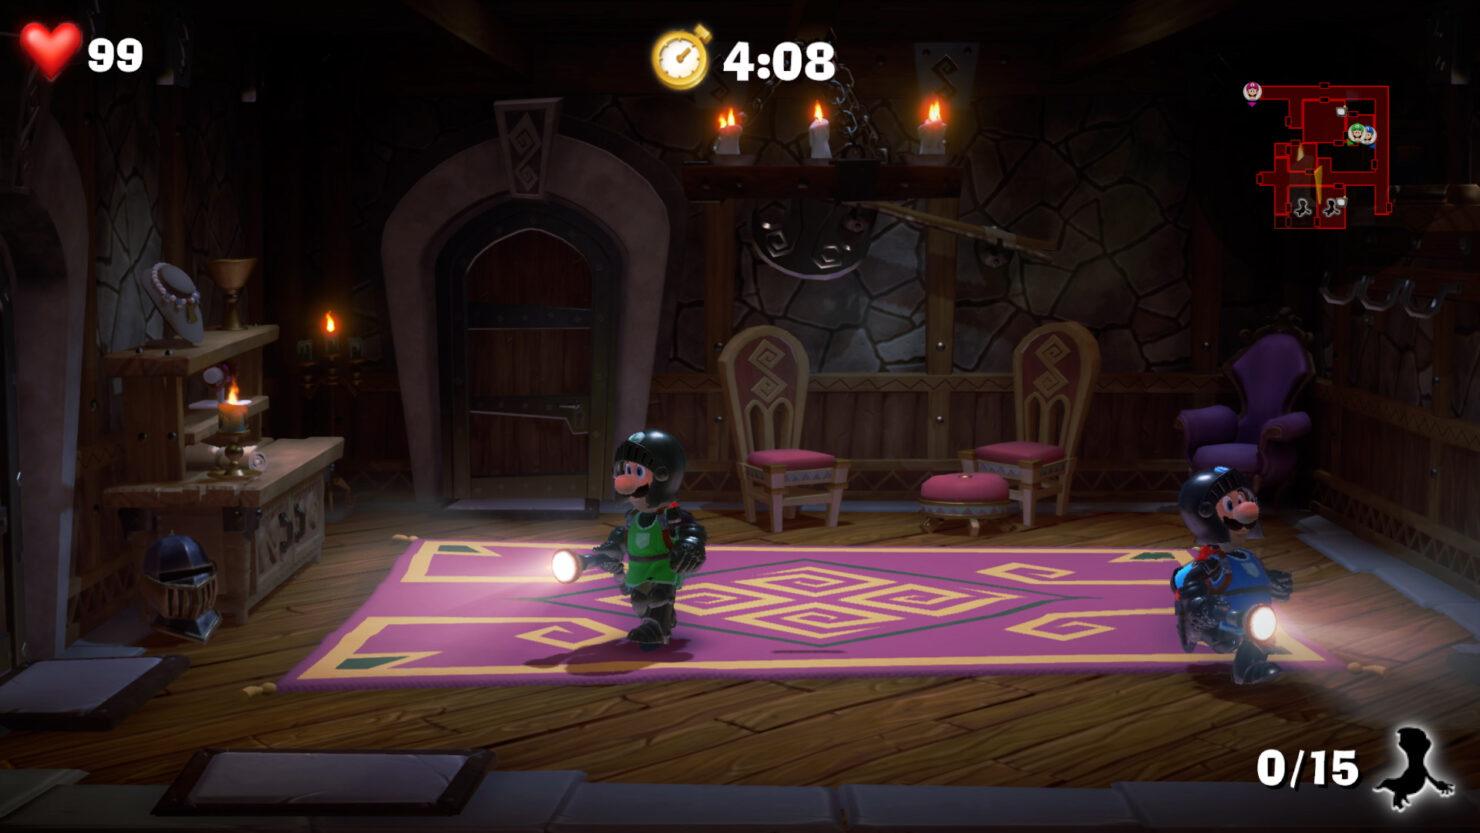 luigis-mansion-3-update-1-2-0-dlc-multiplayer-pack-3